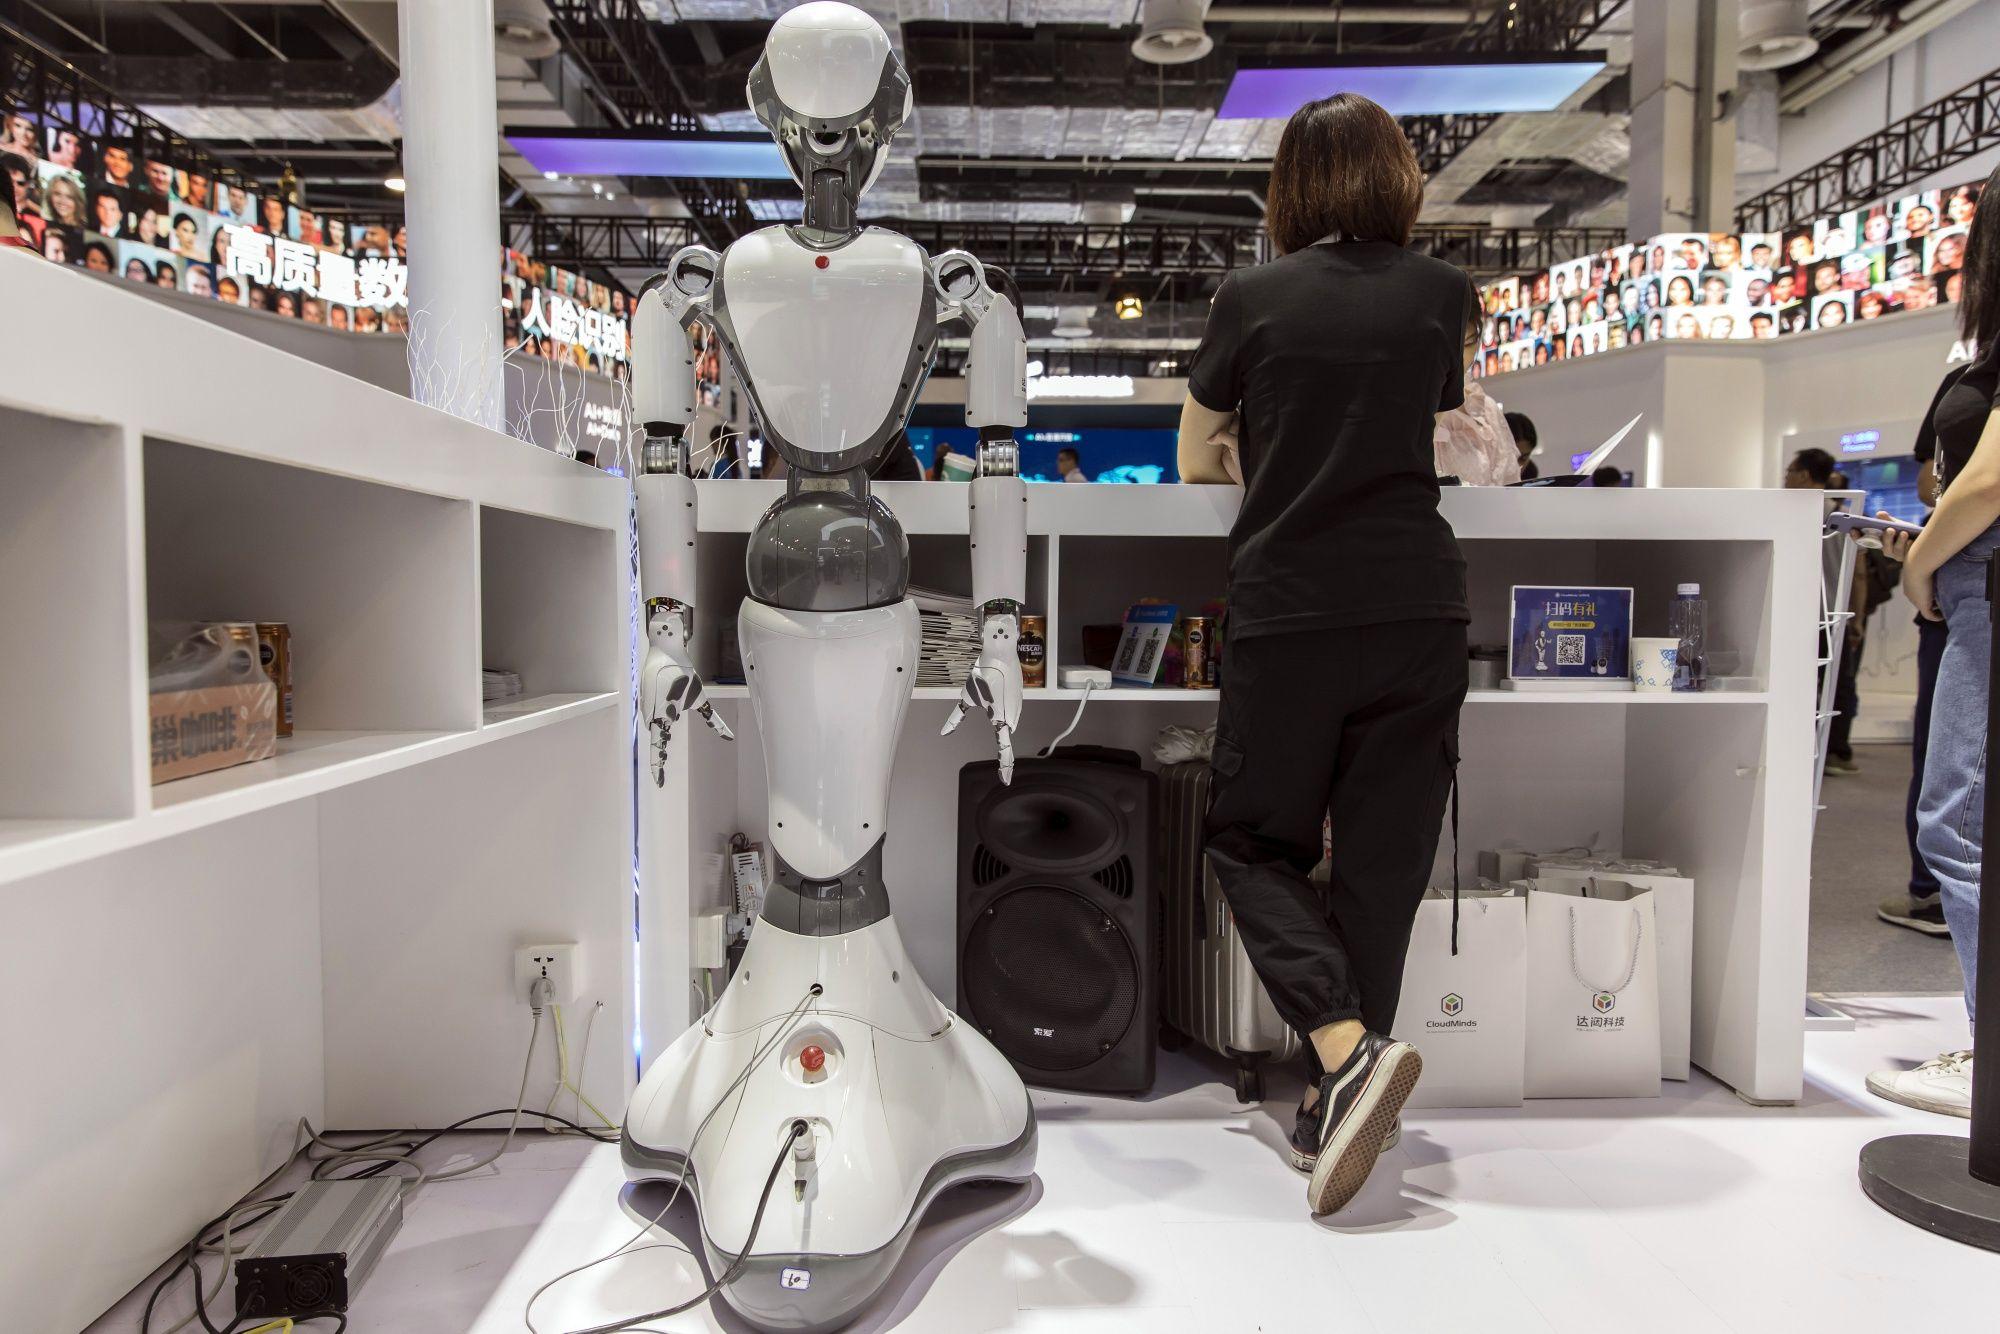 Will Smart Machines Kill Jobs or Create Better Ones? - The Washington Post